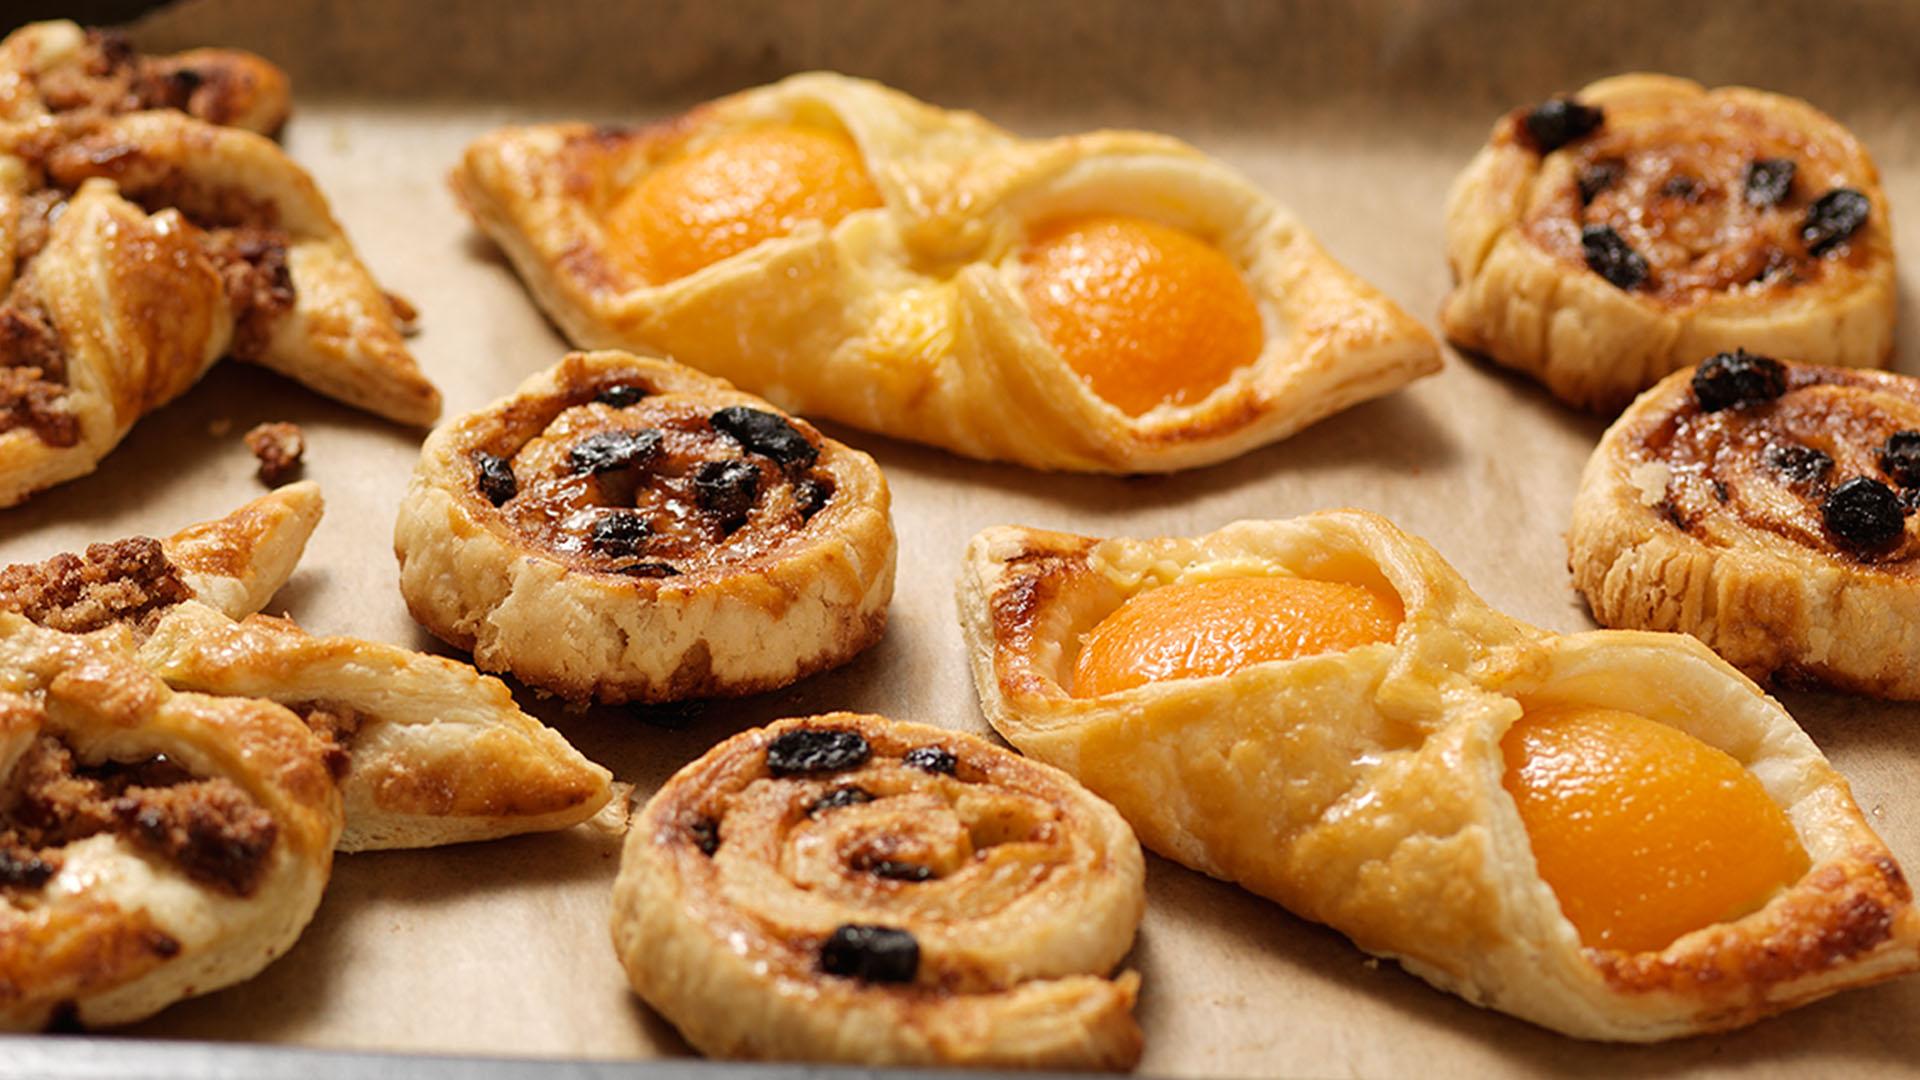 Gluten Free Apricot Custard Danish Pastry Recipe - How to Make Gluten Free Pastry